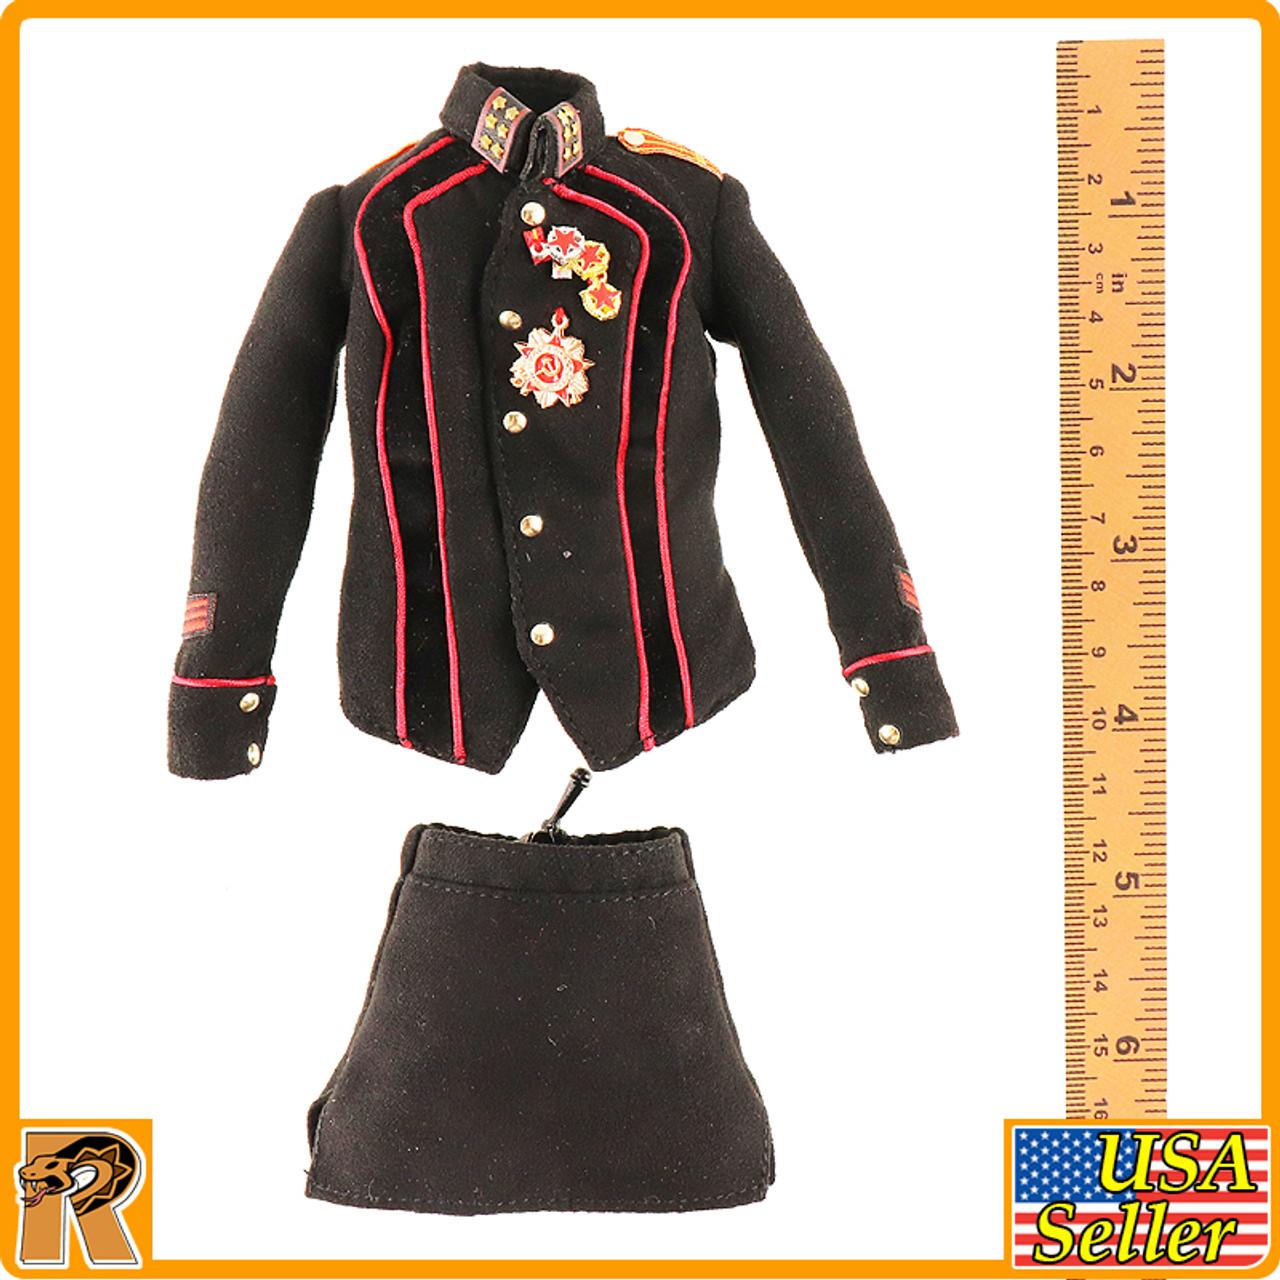 Katyusha Red Alert Soviet Female - Skirt Uniform Set - 1/6 Scale -